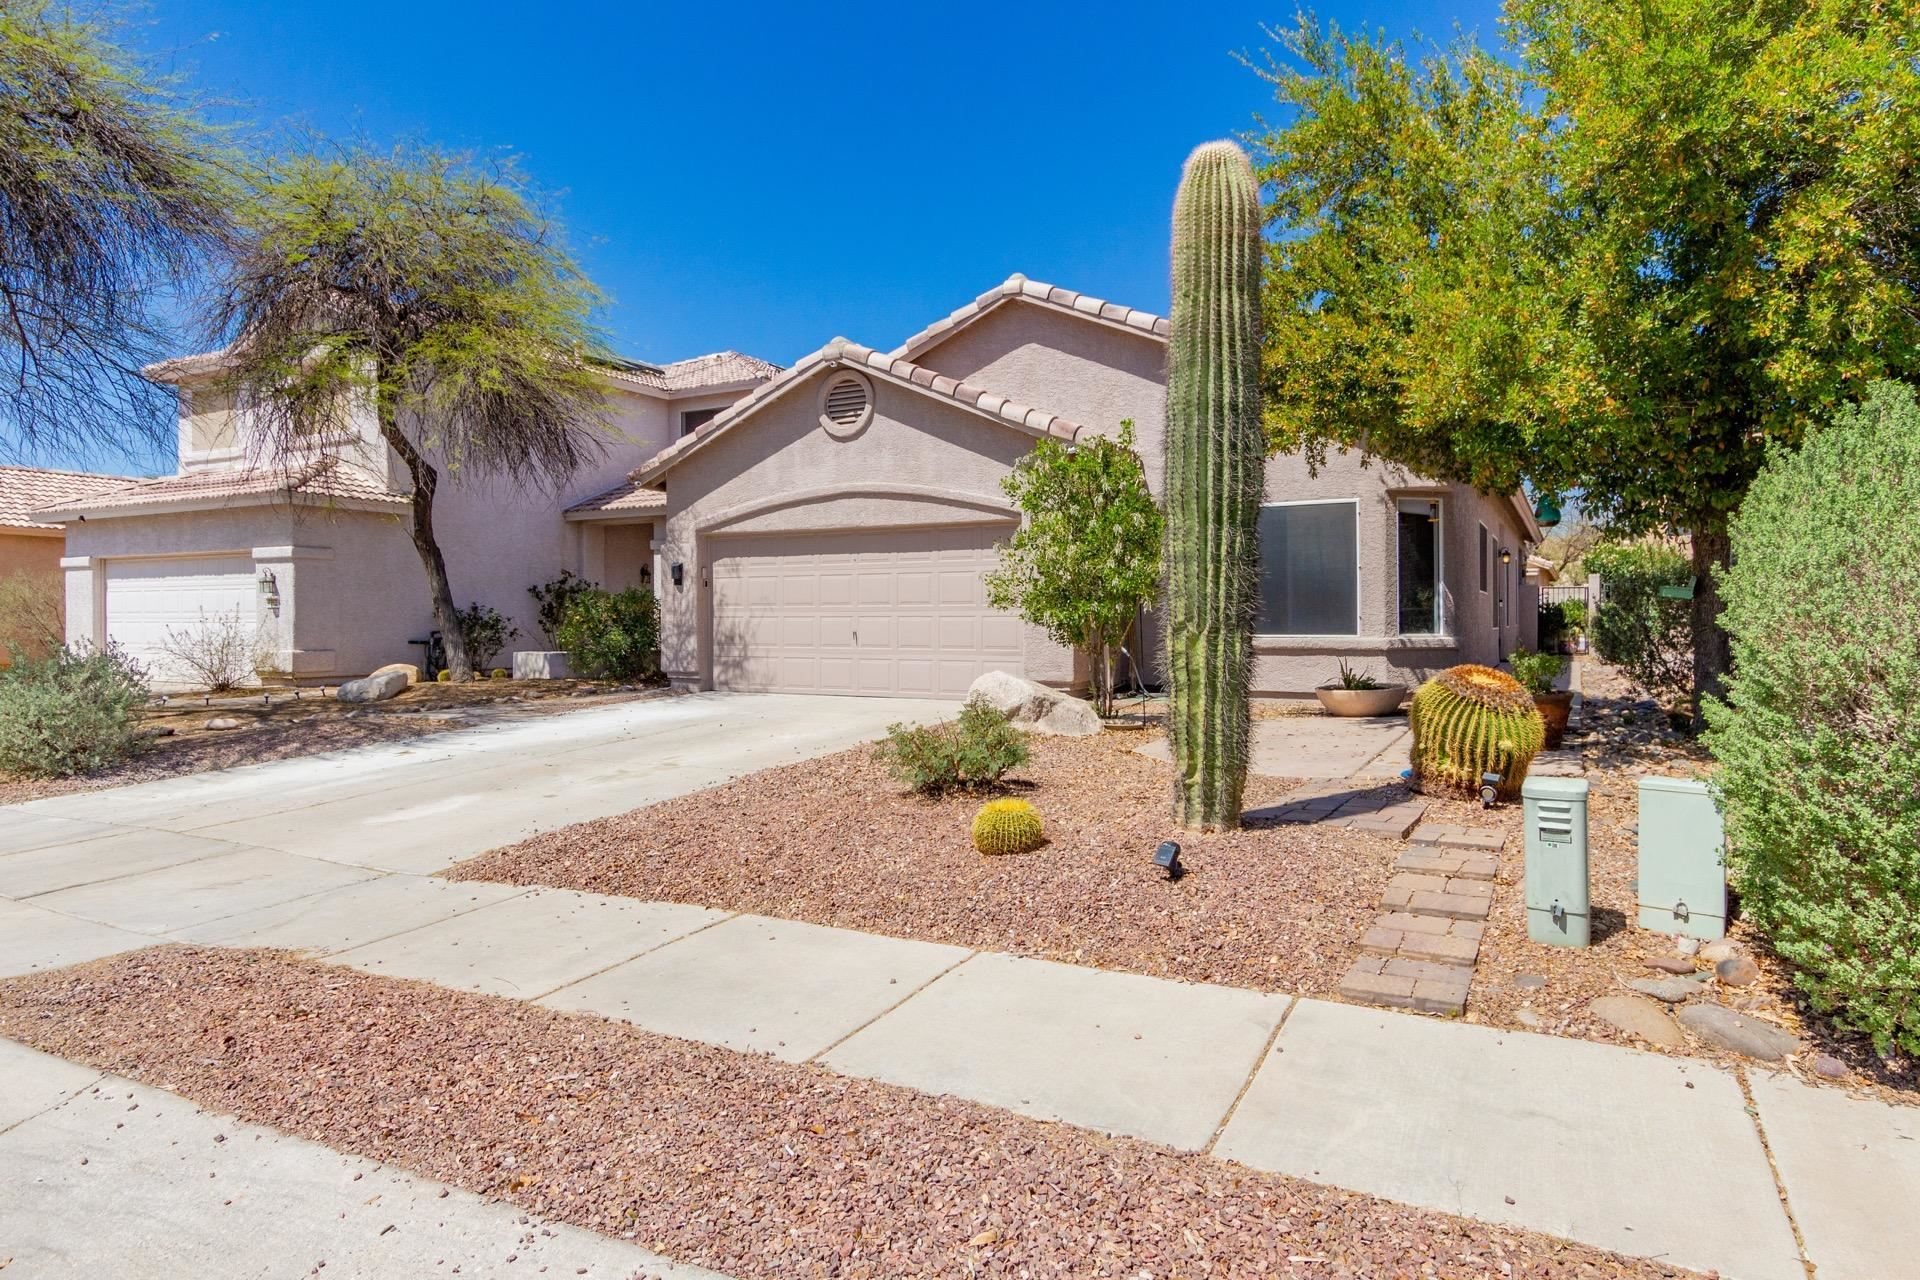 7346 W Mesquite River Drive, Tucson, AZ 85743 - MLS#: 22108846